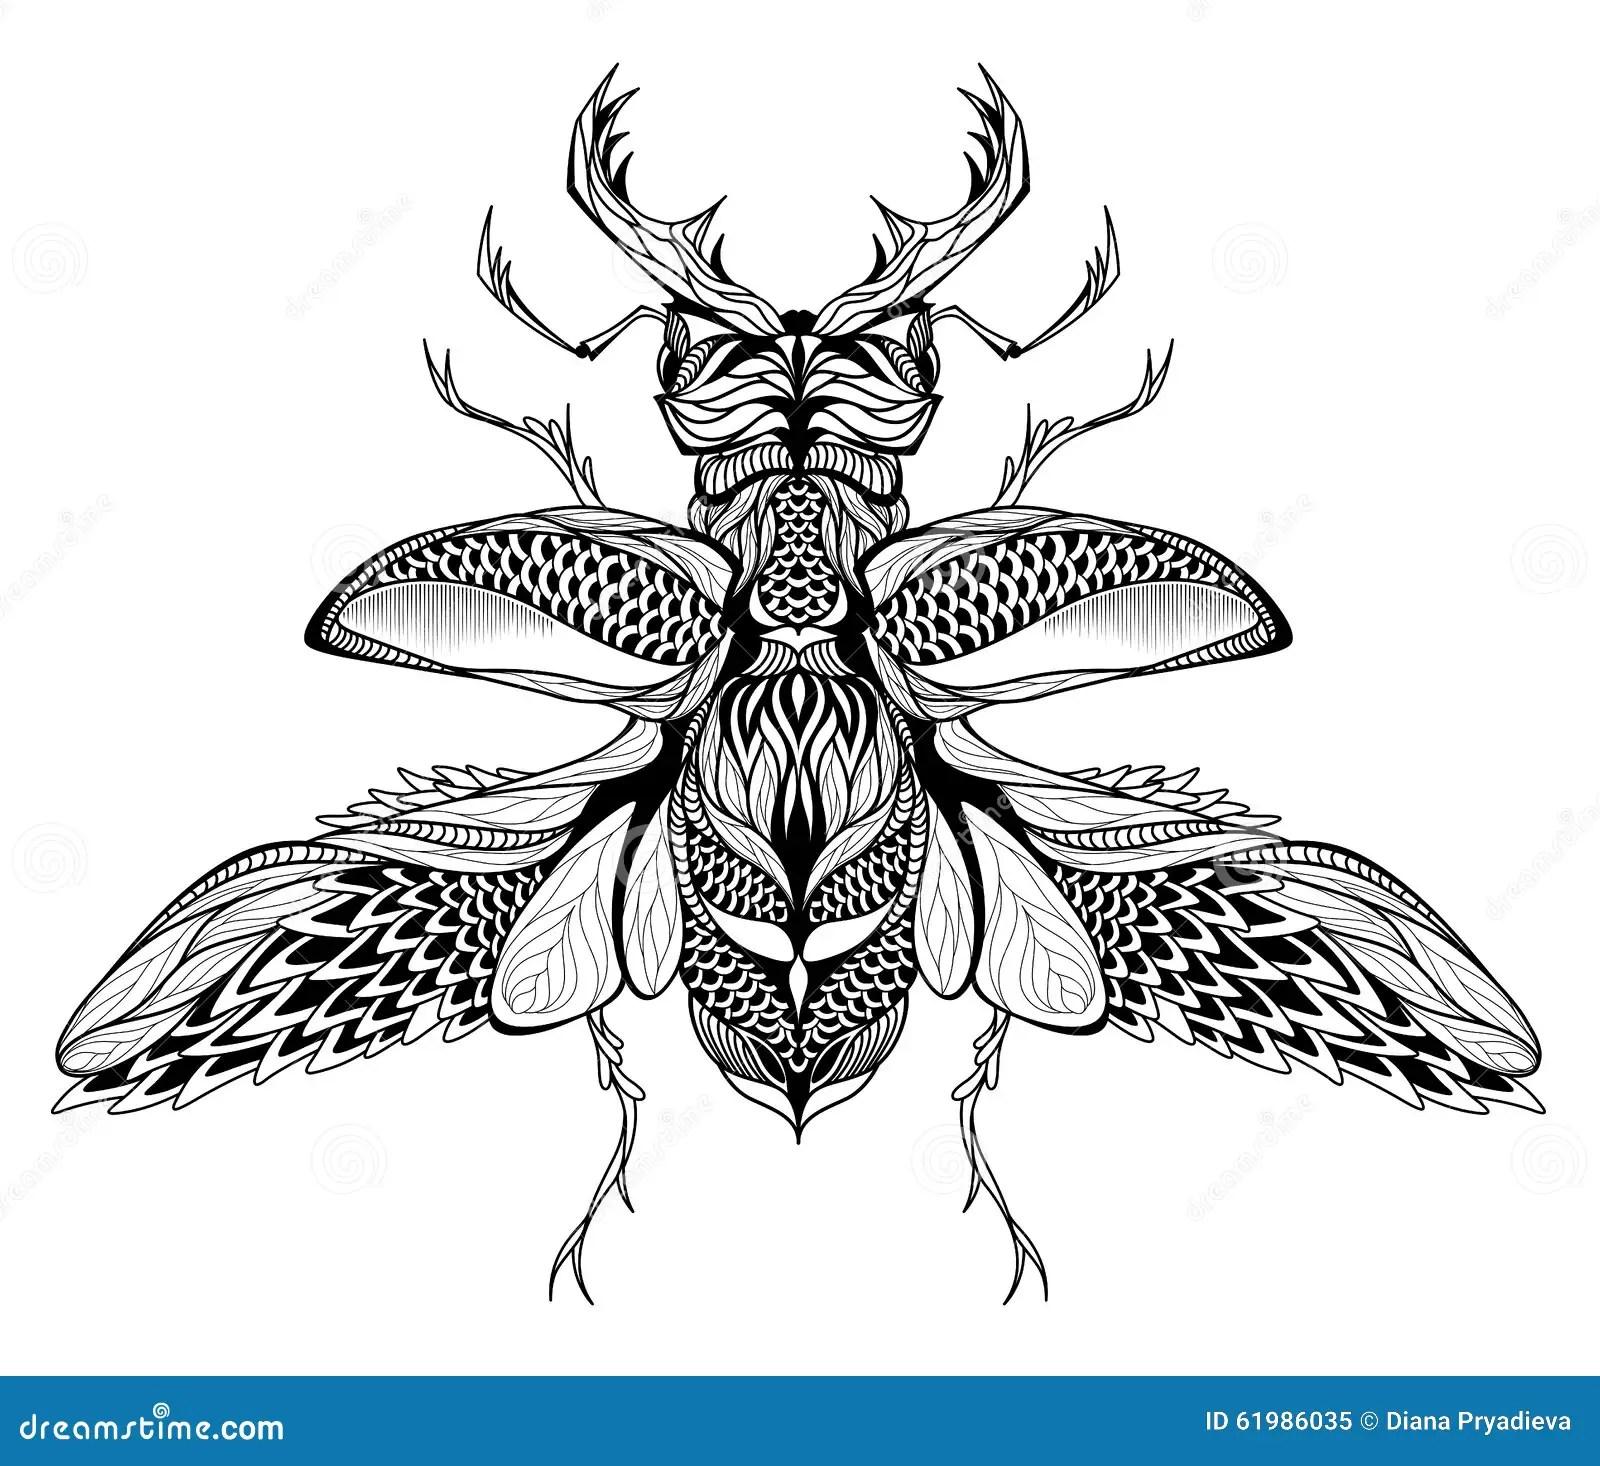 Tatuaje Del Macho Escarabajo Psicodélico Estilo Del Zentangle